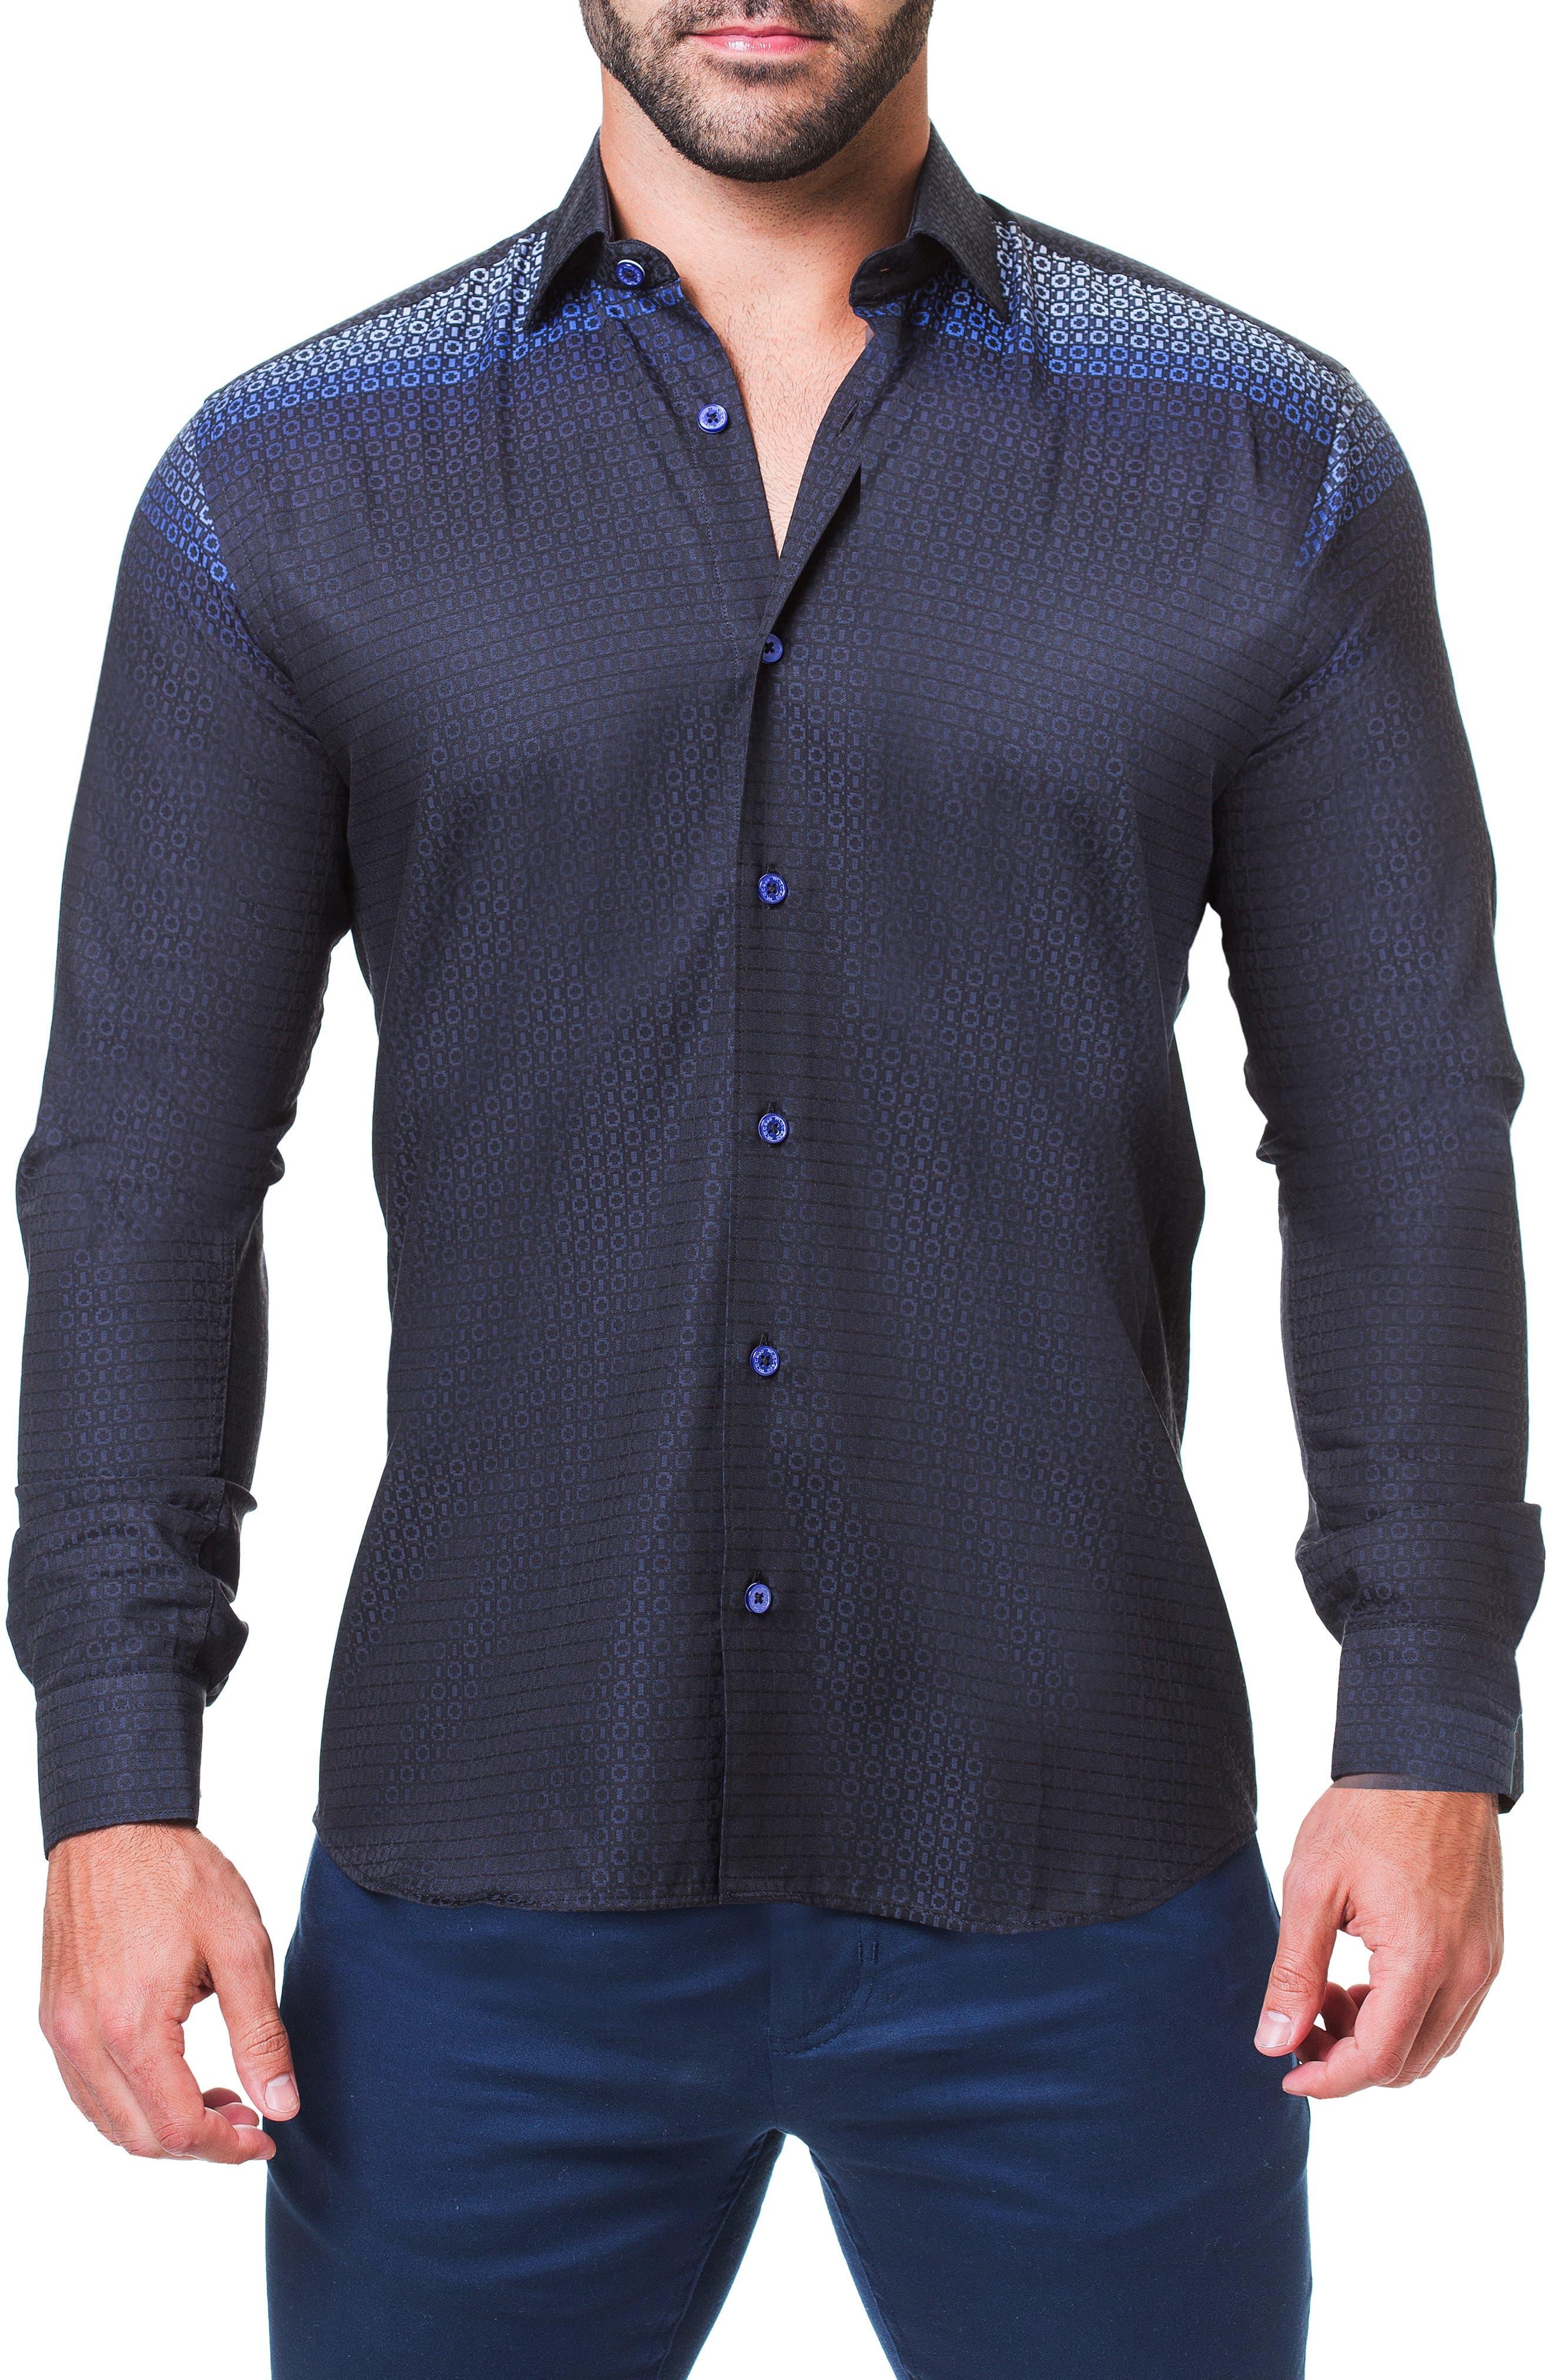 Fibonacci Mondrian Trim Fit Sport Shirt,                             Main thumbnail 1, color,                             BLUE